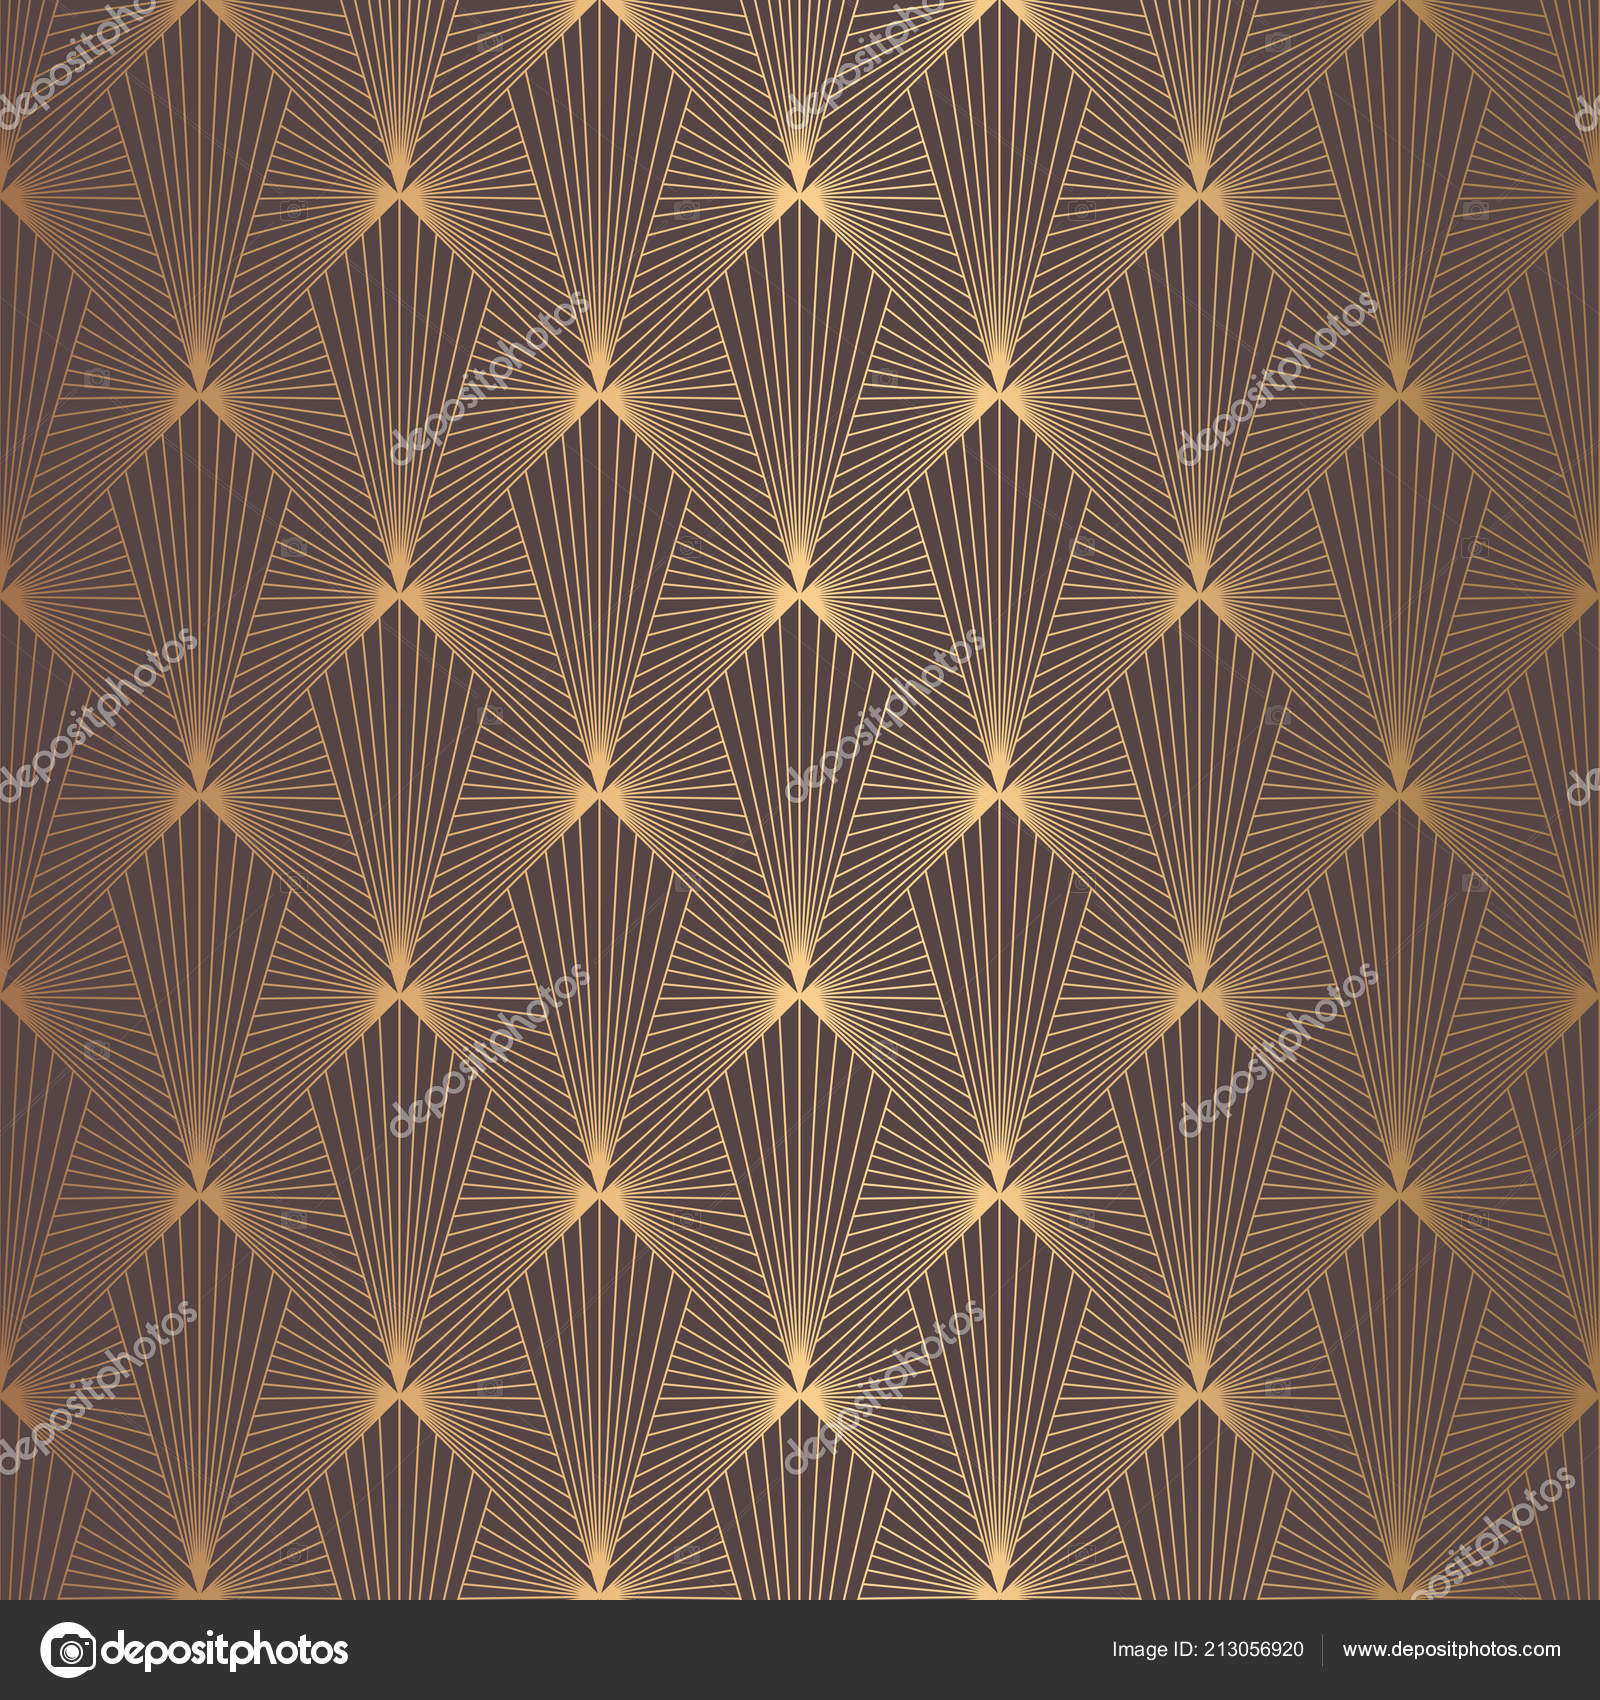 Prime Art Deco Design Motif Art Deco Pattern Seamless Golden Download Free Architecture Designs Grimeyleaguecom